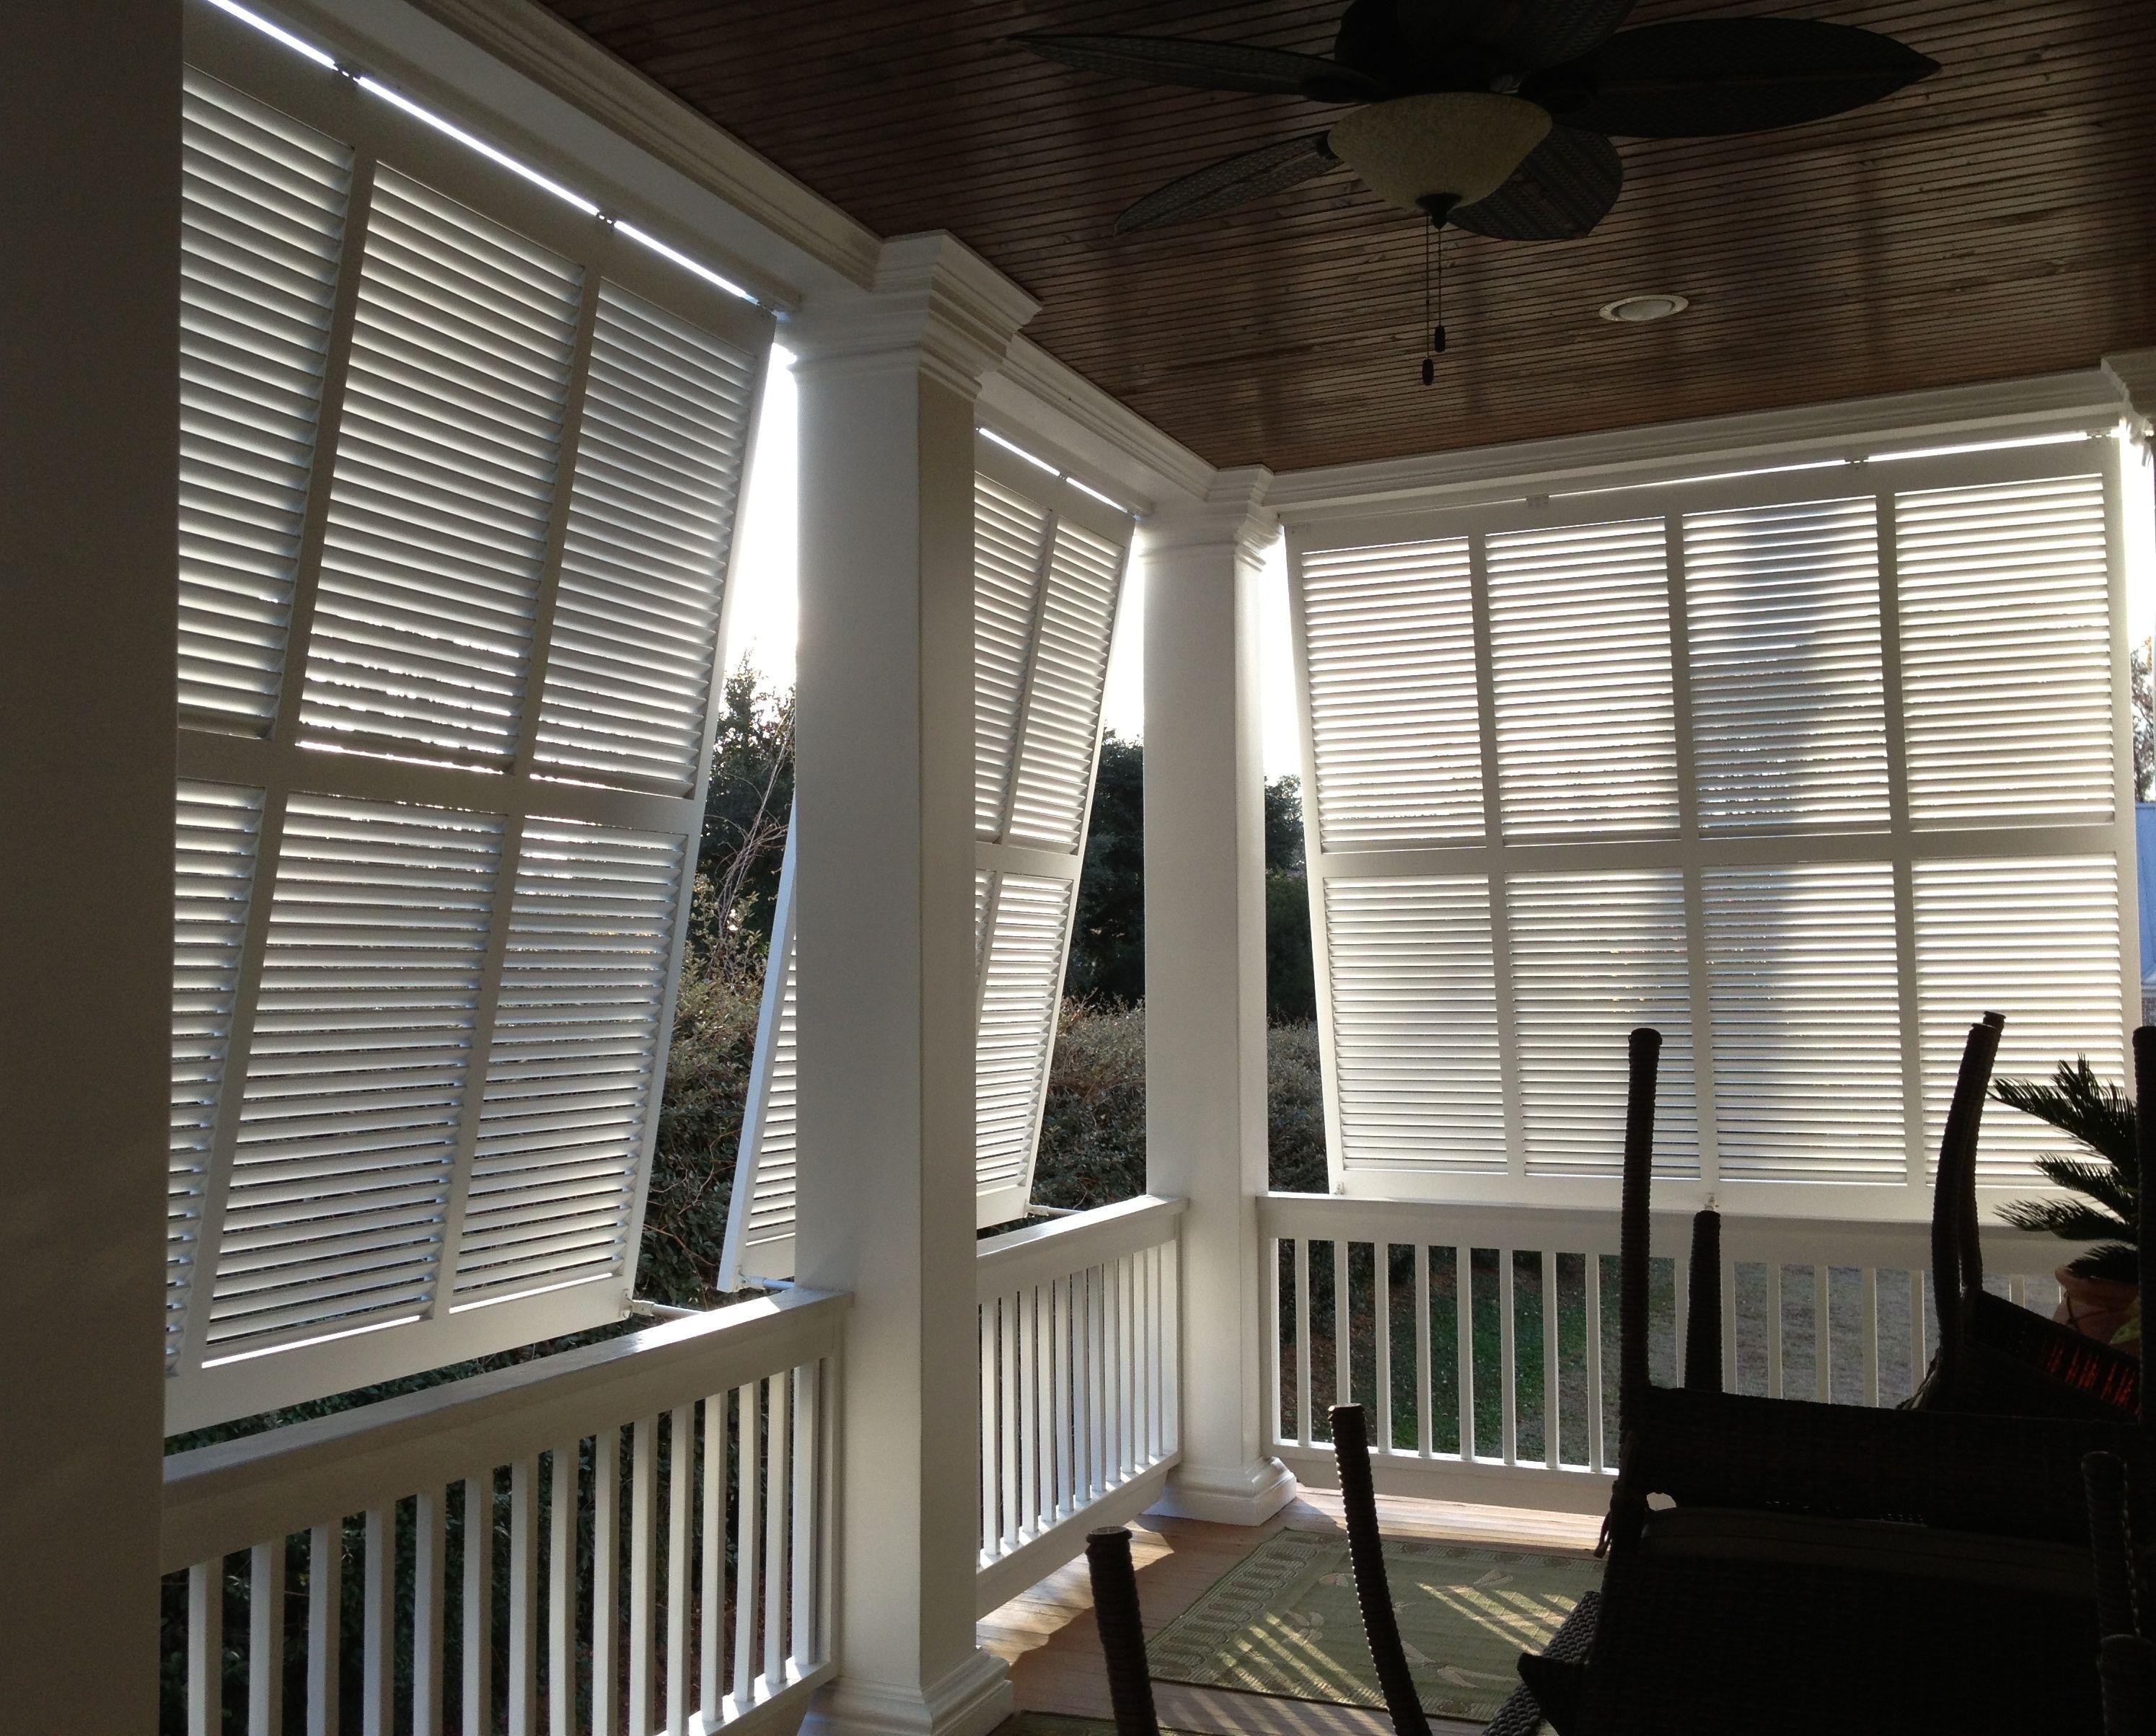 Bahama Carolina Blind Amp Shutter Inc House With Porch